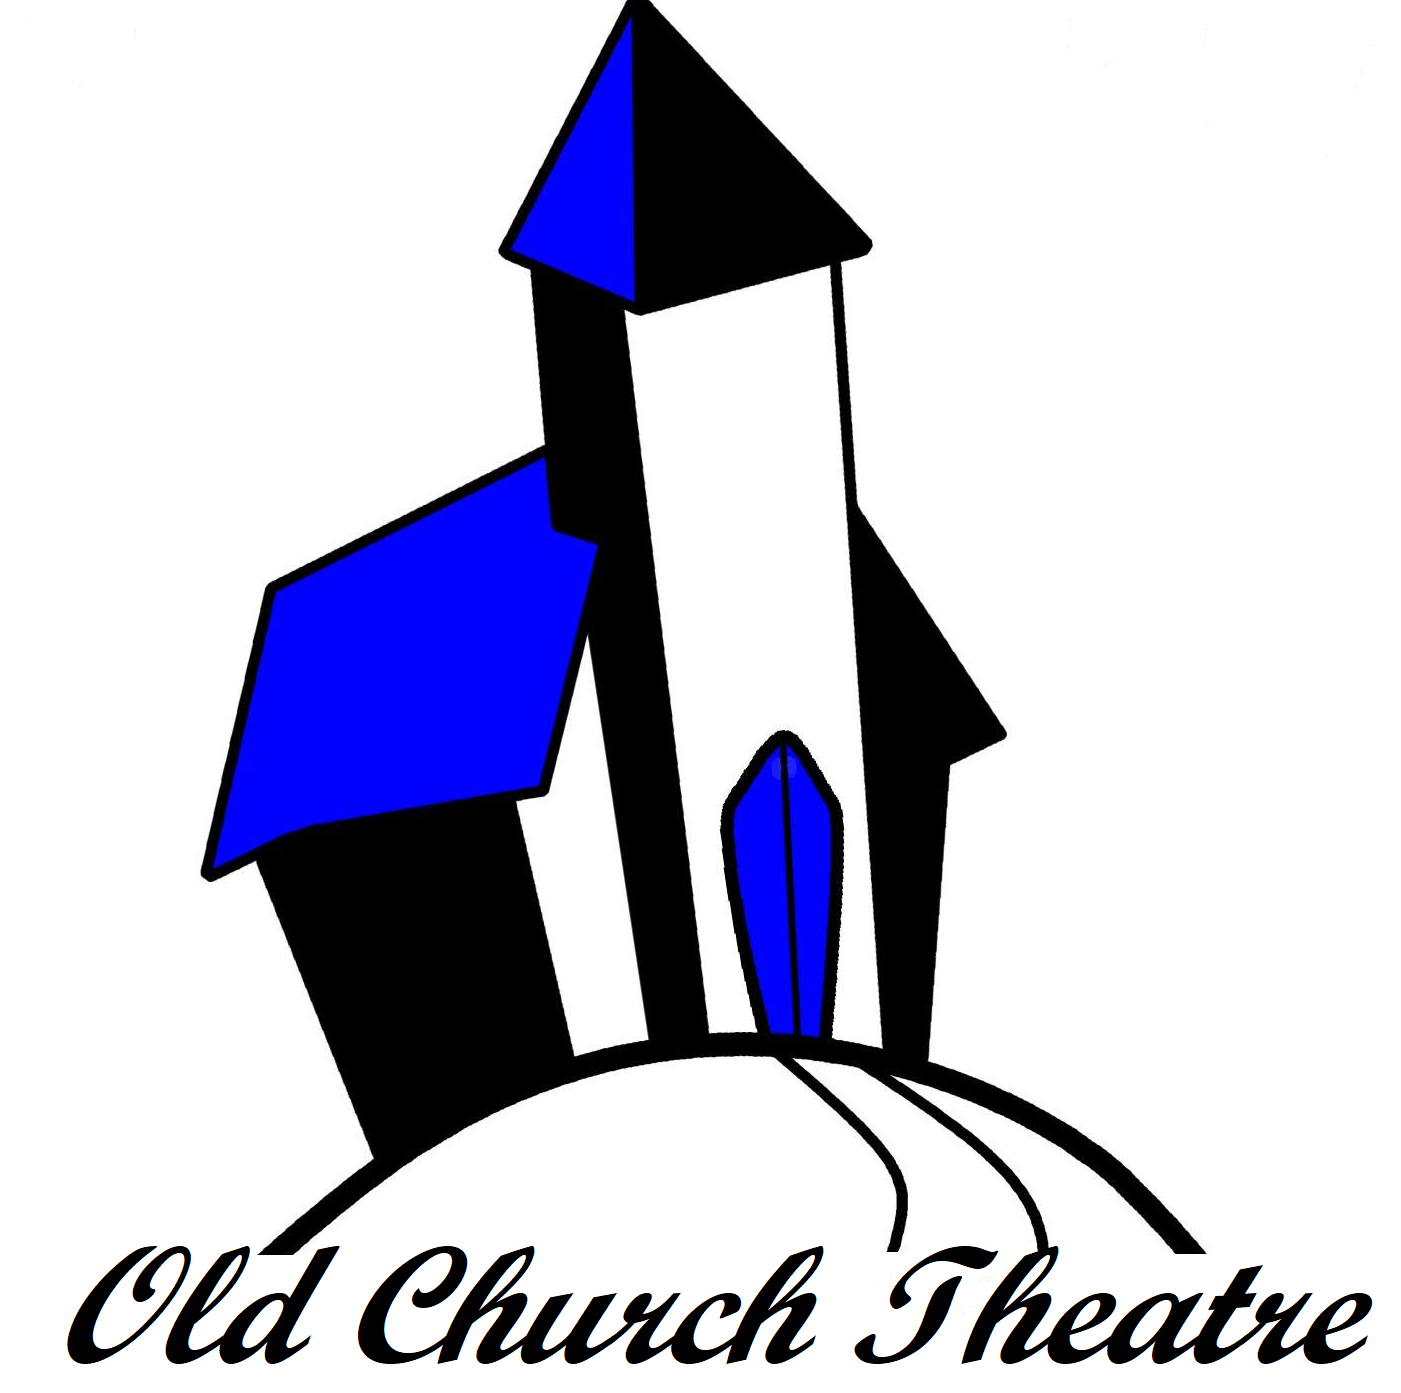 Old Church Theatre